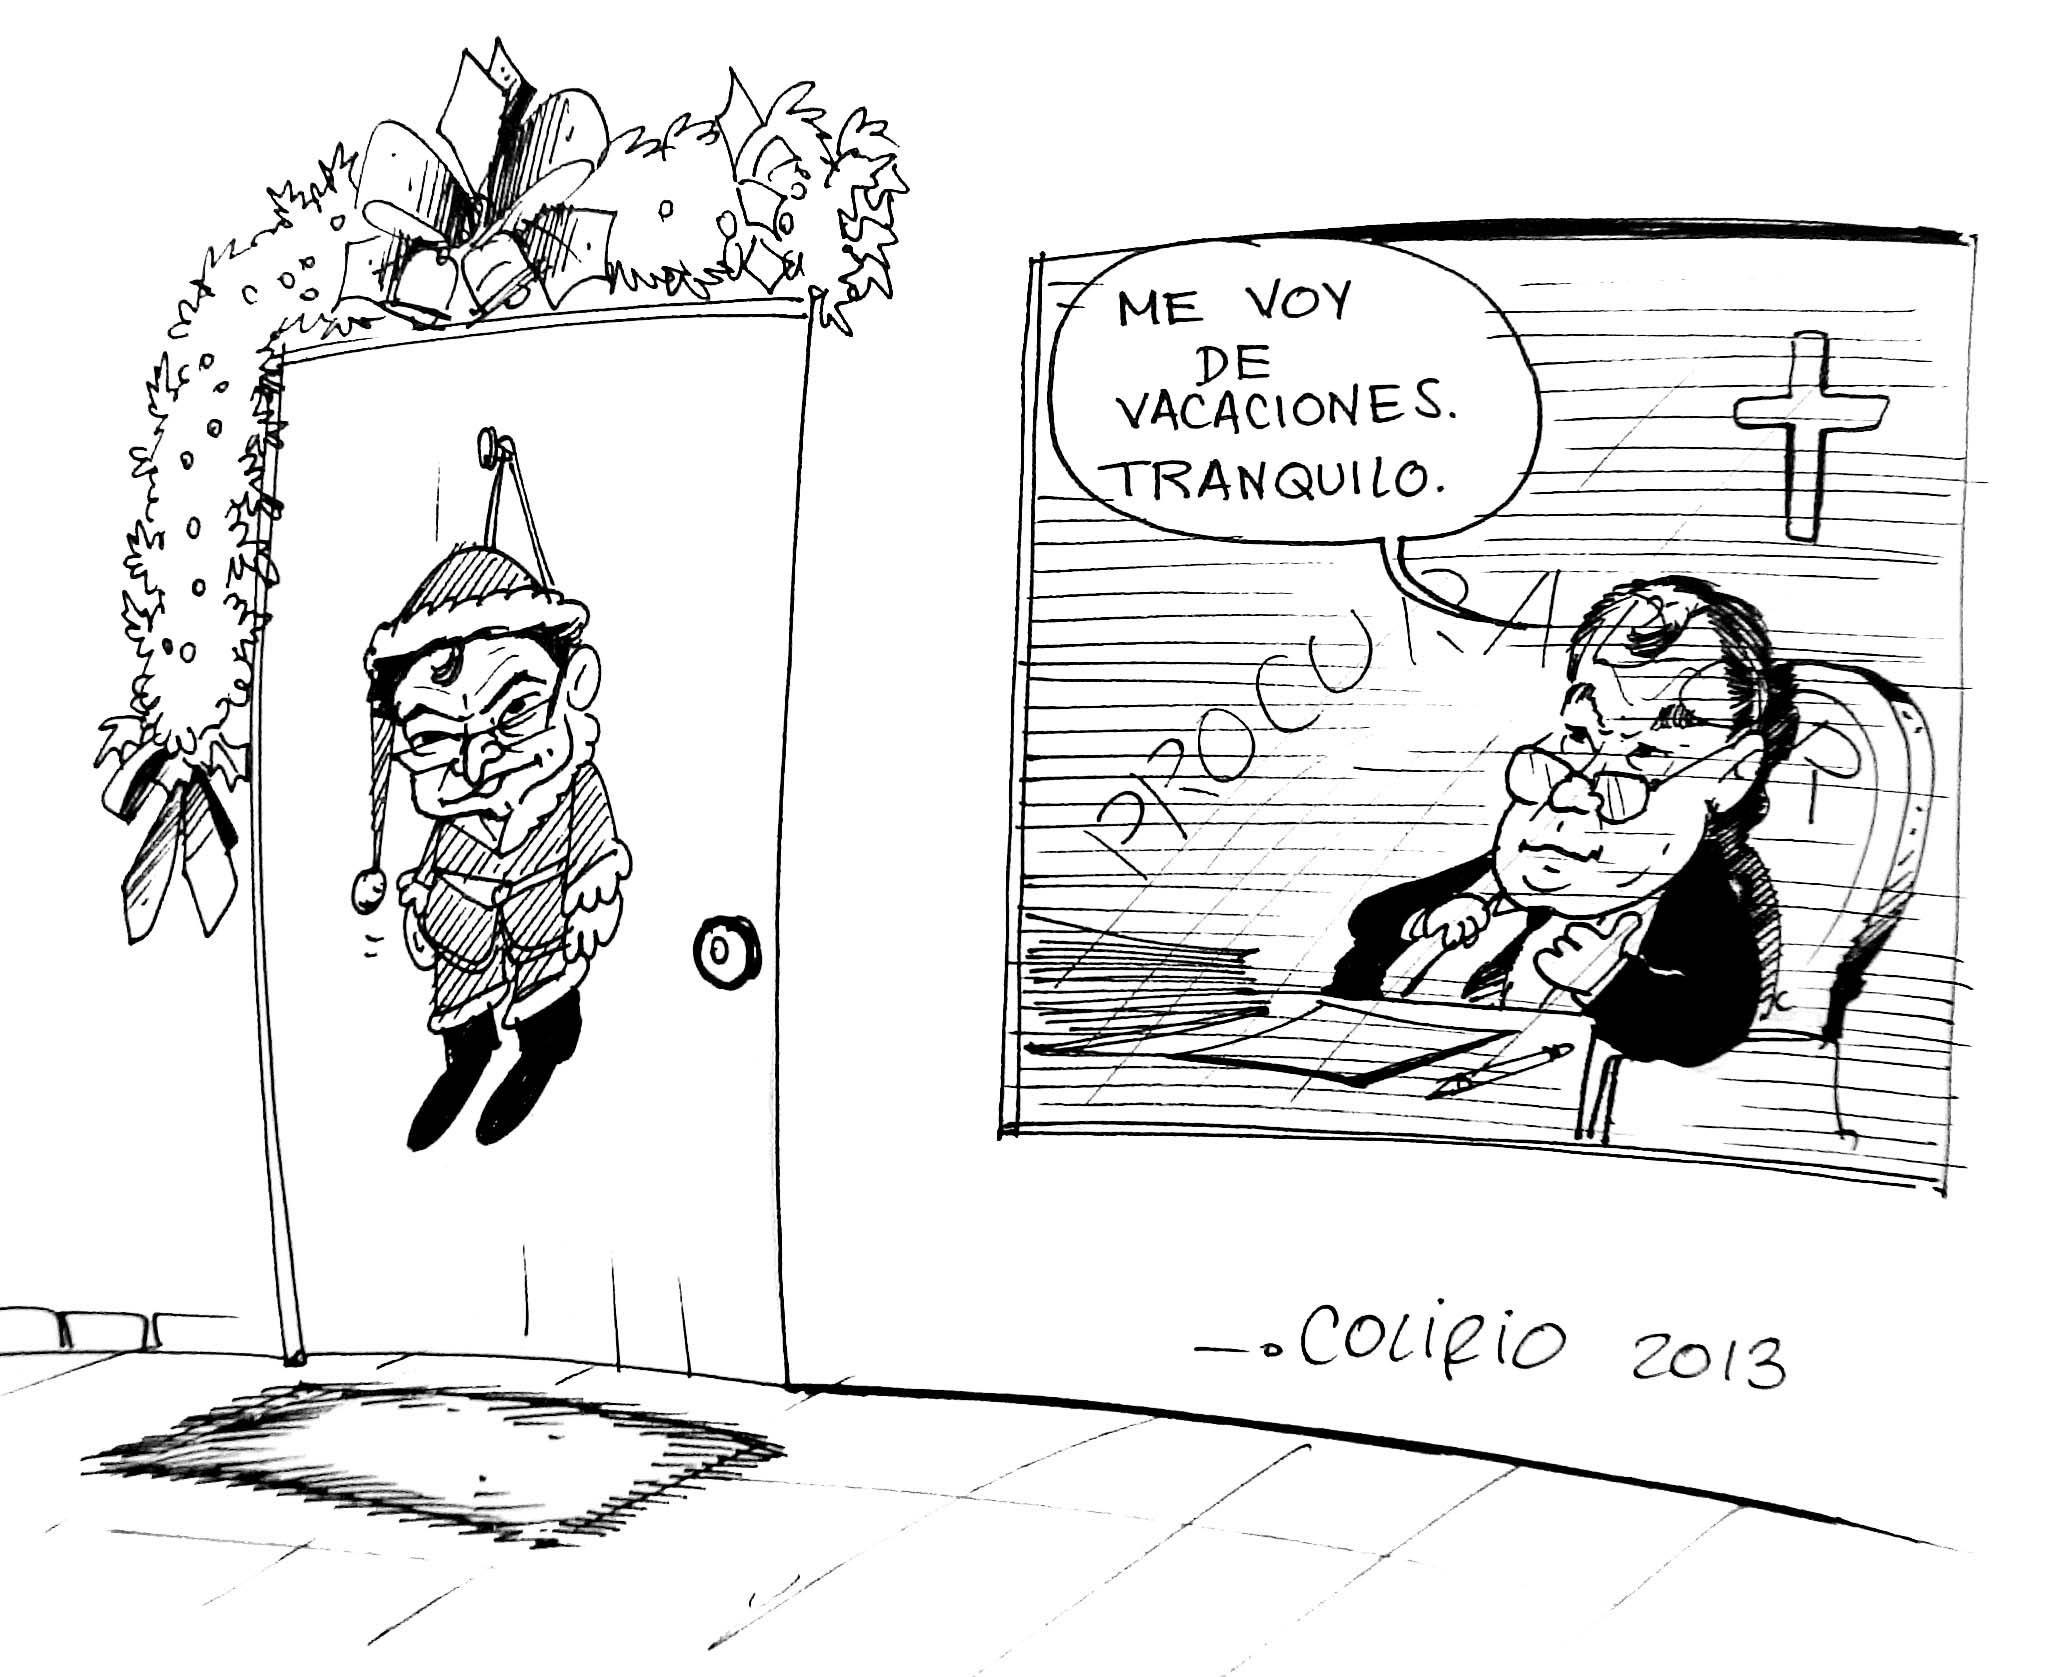 carica miercoles 18 de dic de 2013